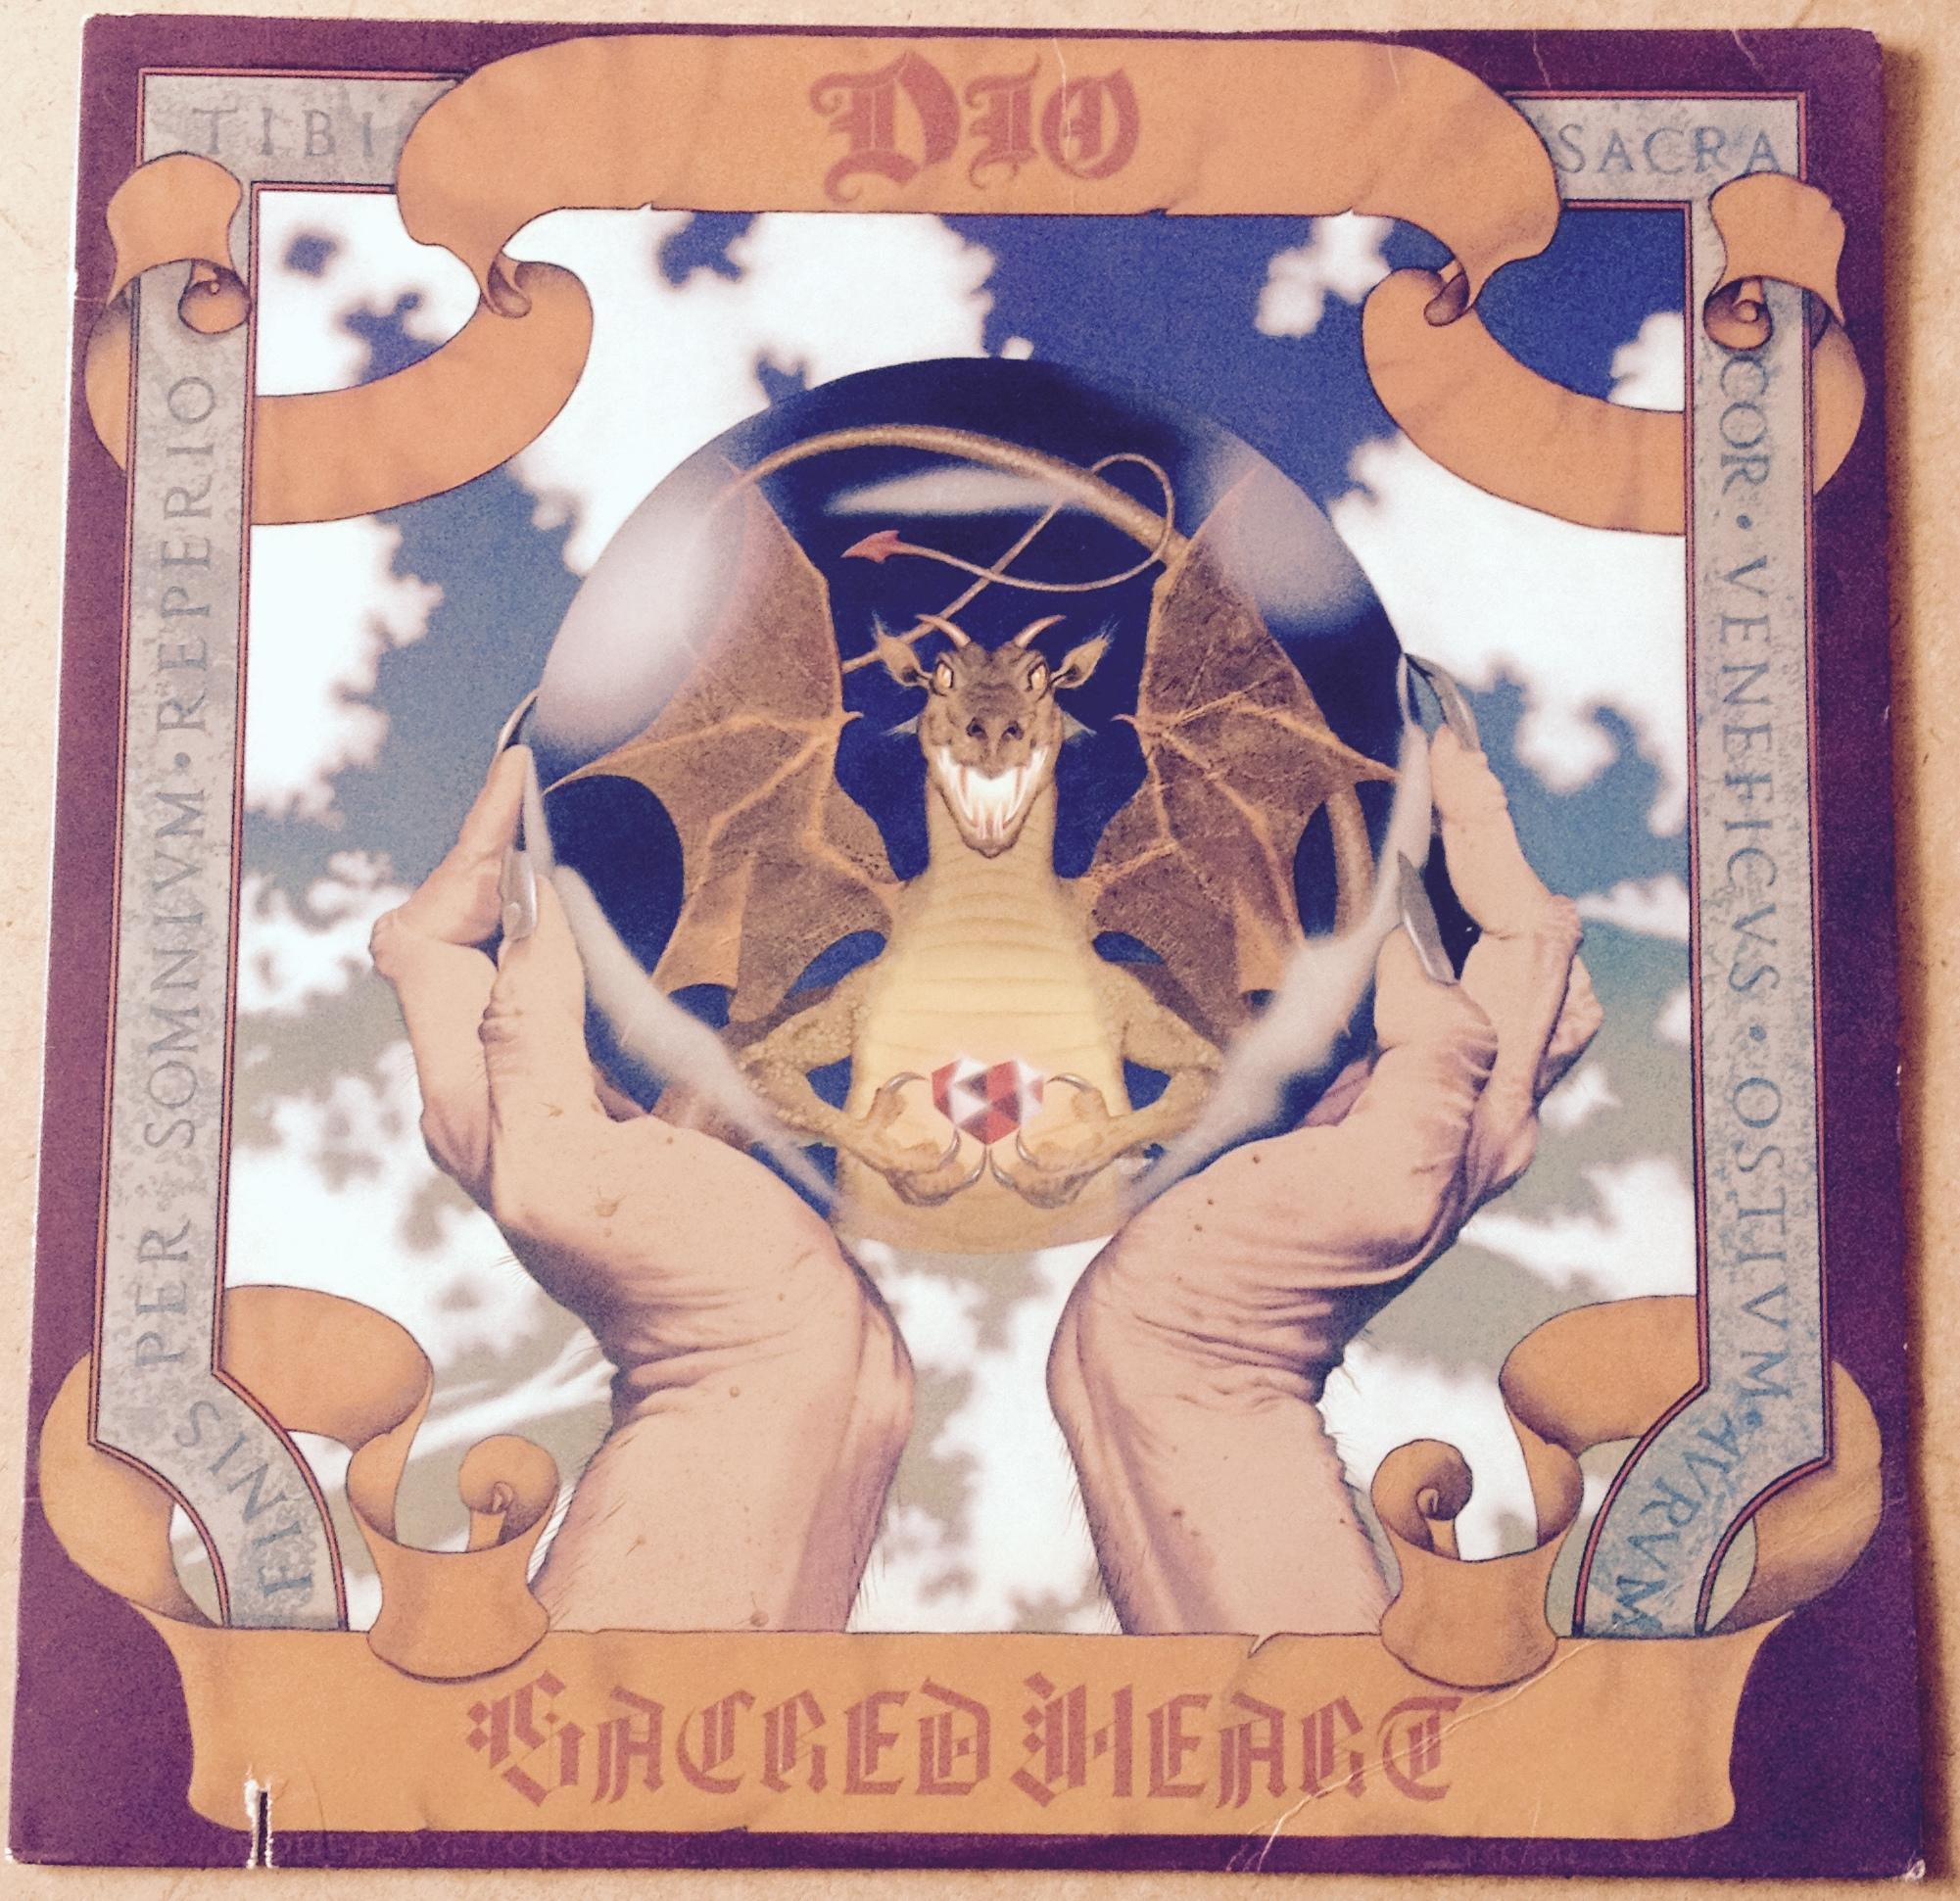 Sacred Heart LP Image